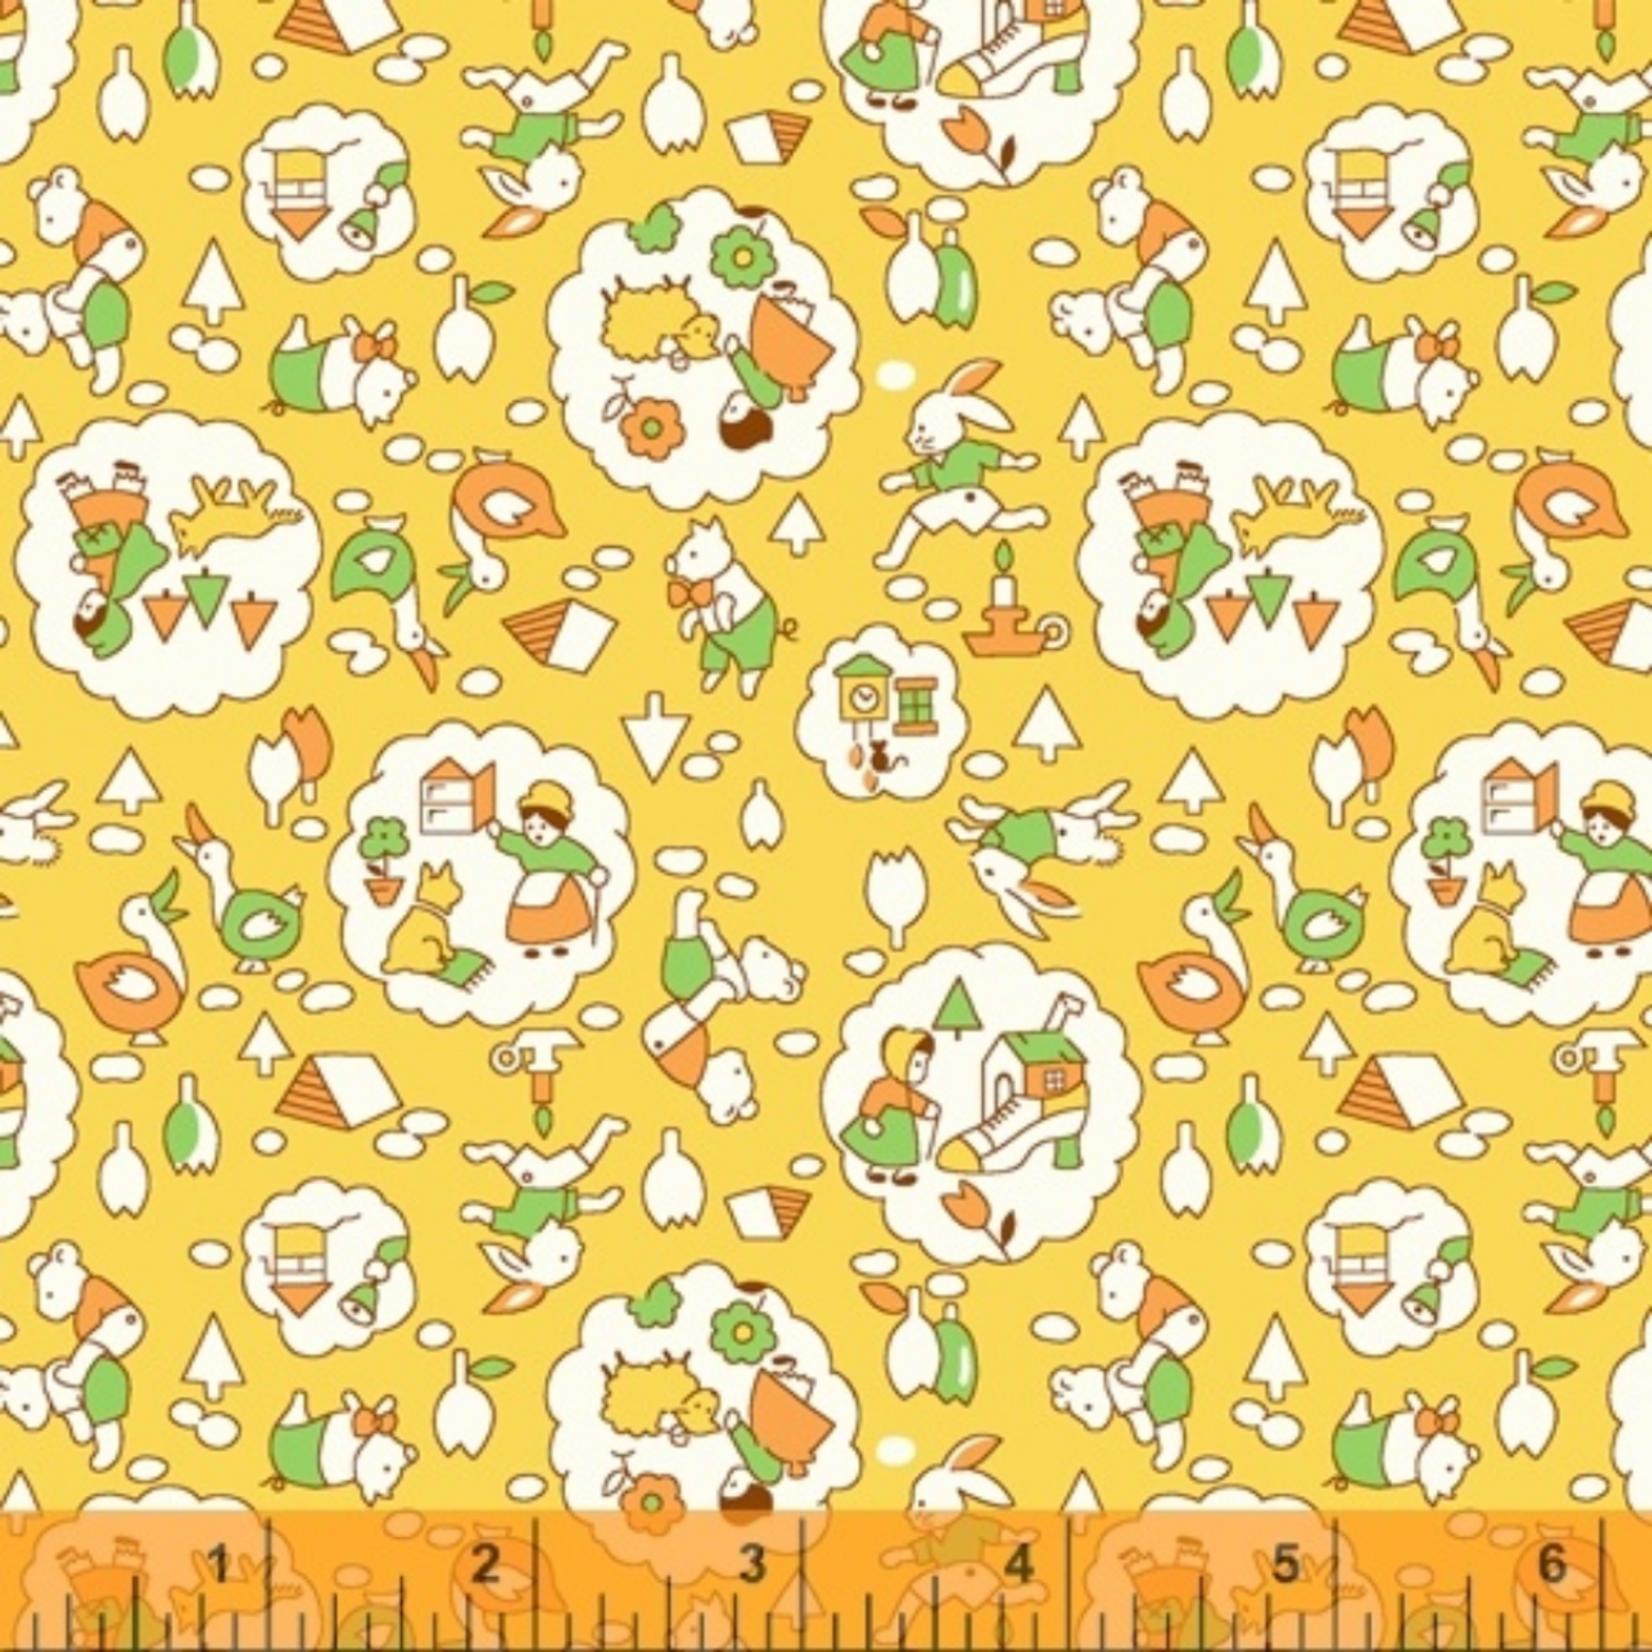 Windham Fabrics STORYBOOK, NURSERY, YELLOW (51978-4) PER CM OR $20/M